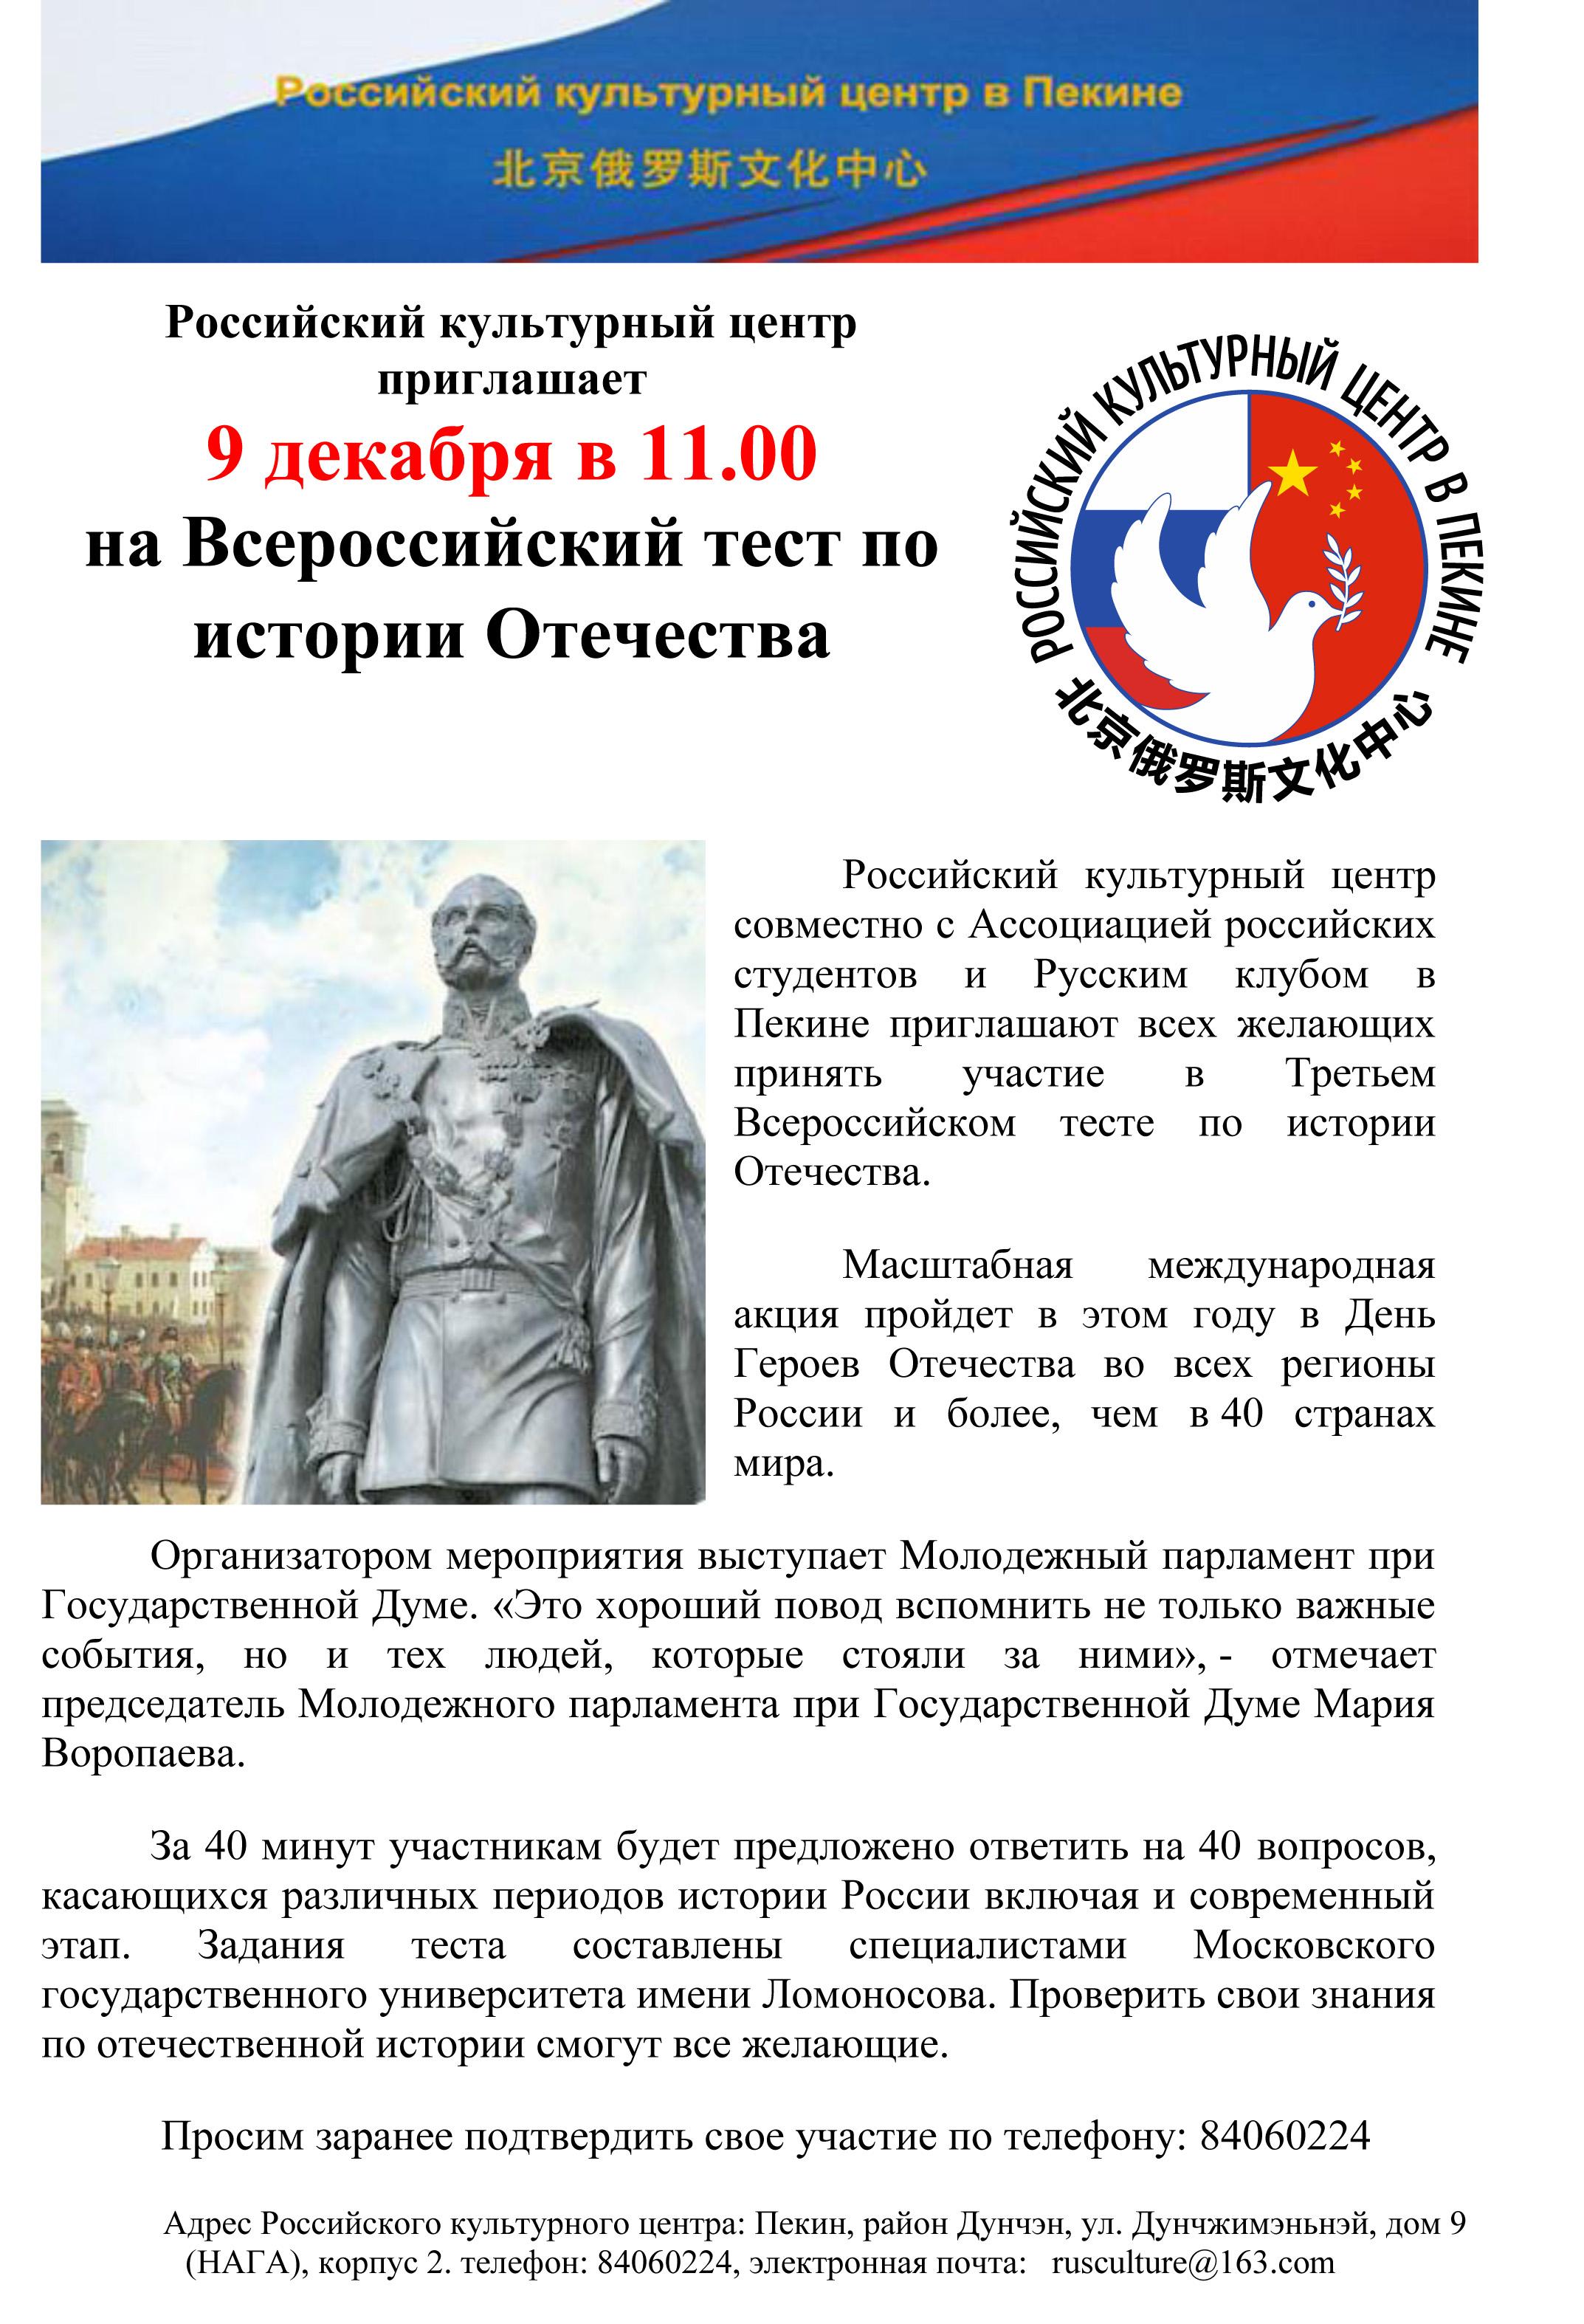 тест по истории Отечества пресс-релиз